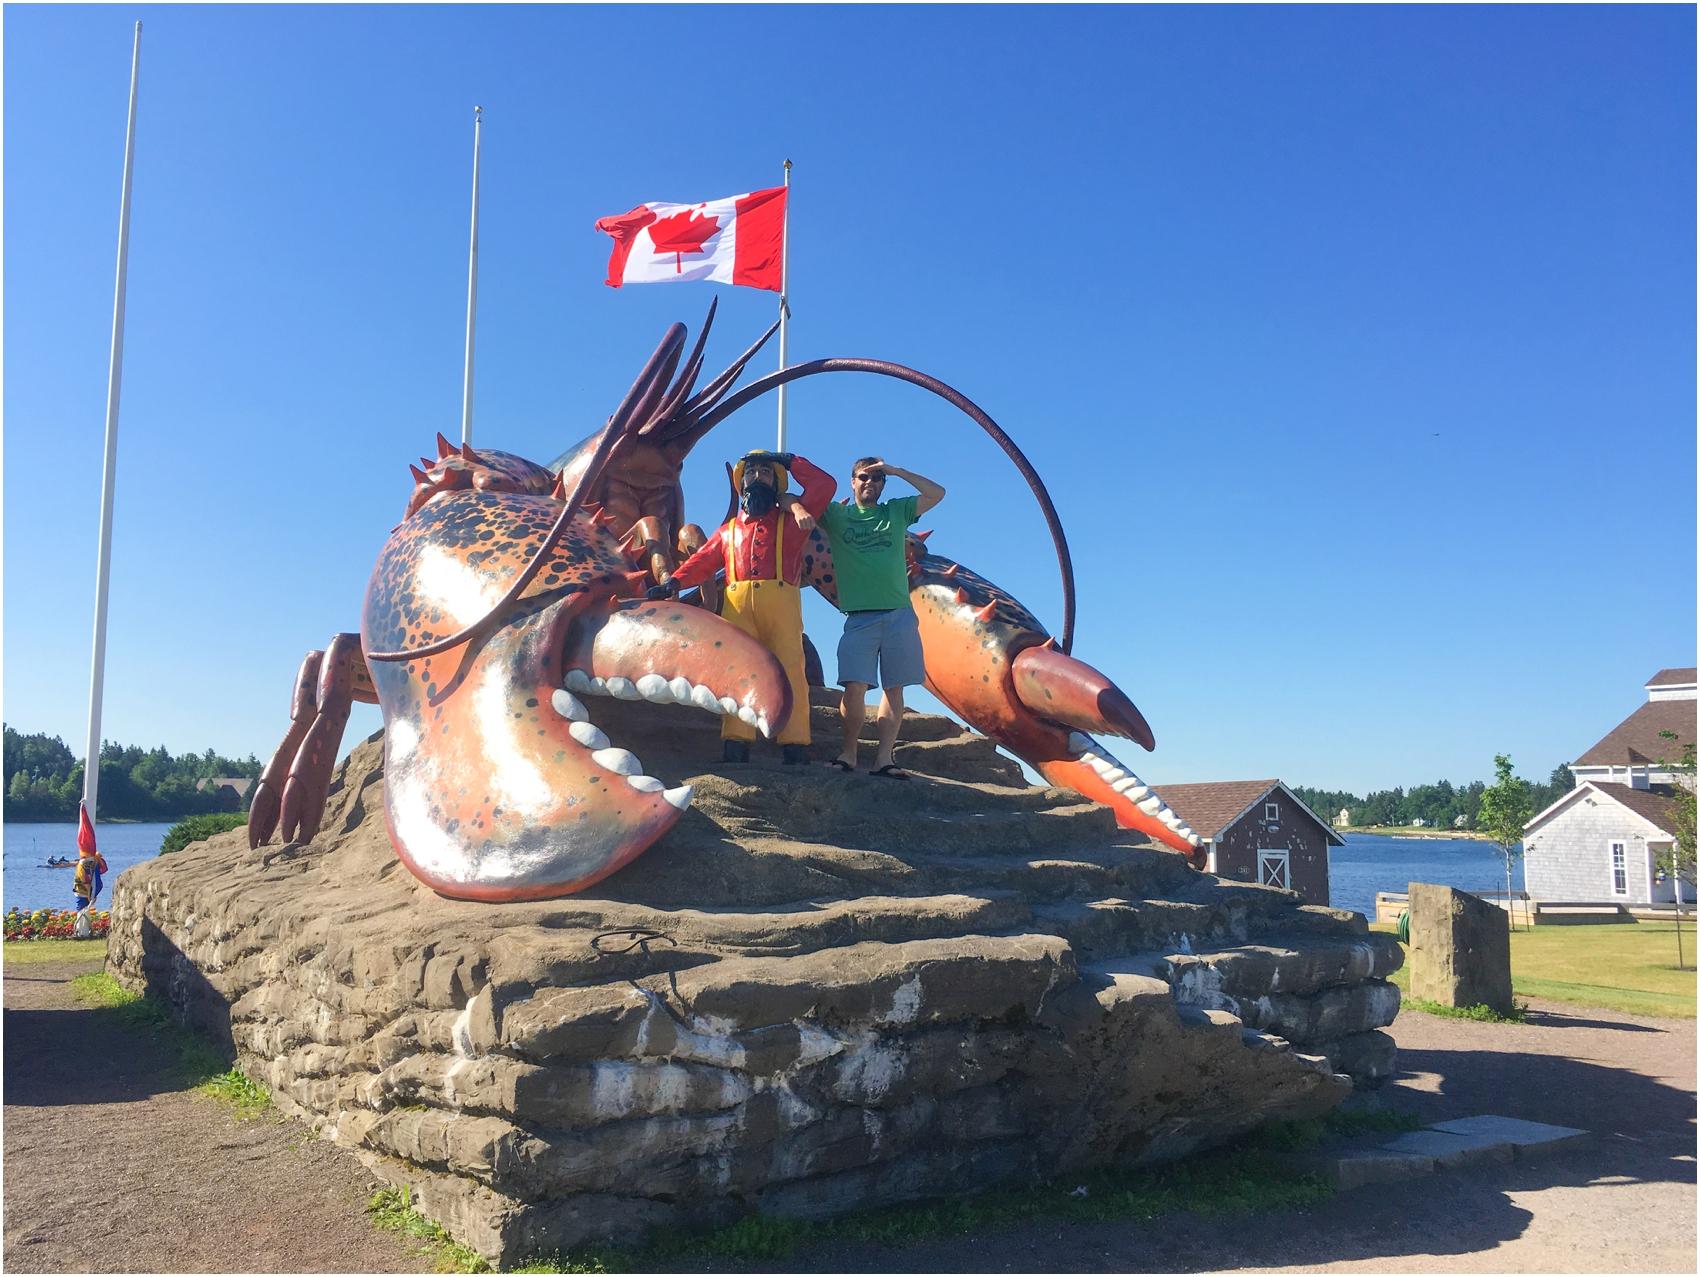 CanadianRoadTrip2016-44.jpg